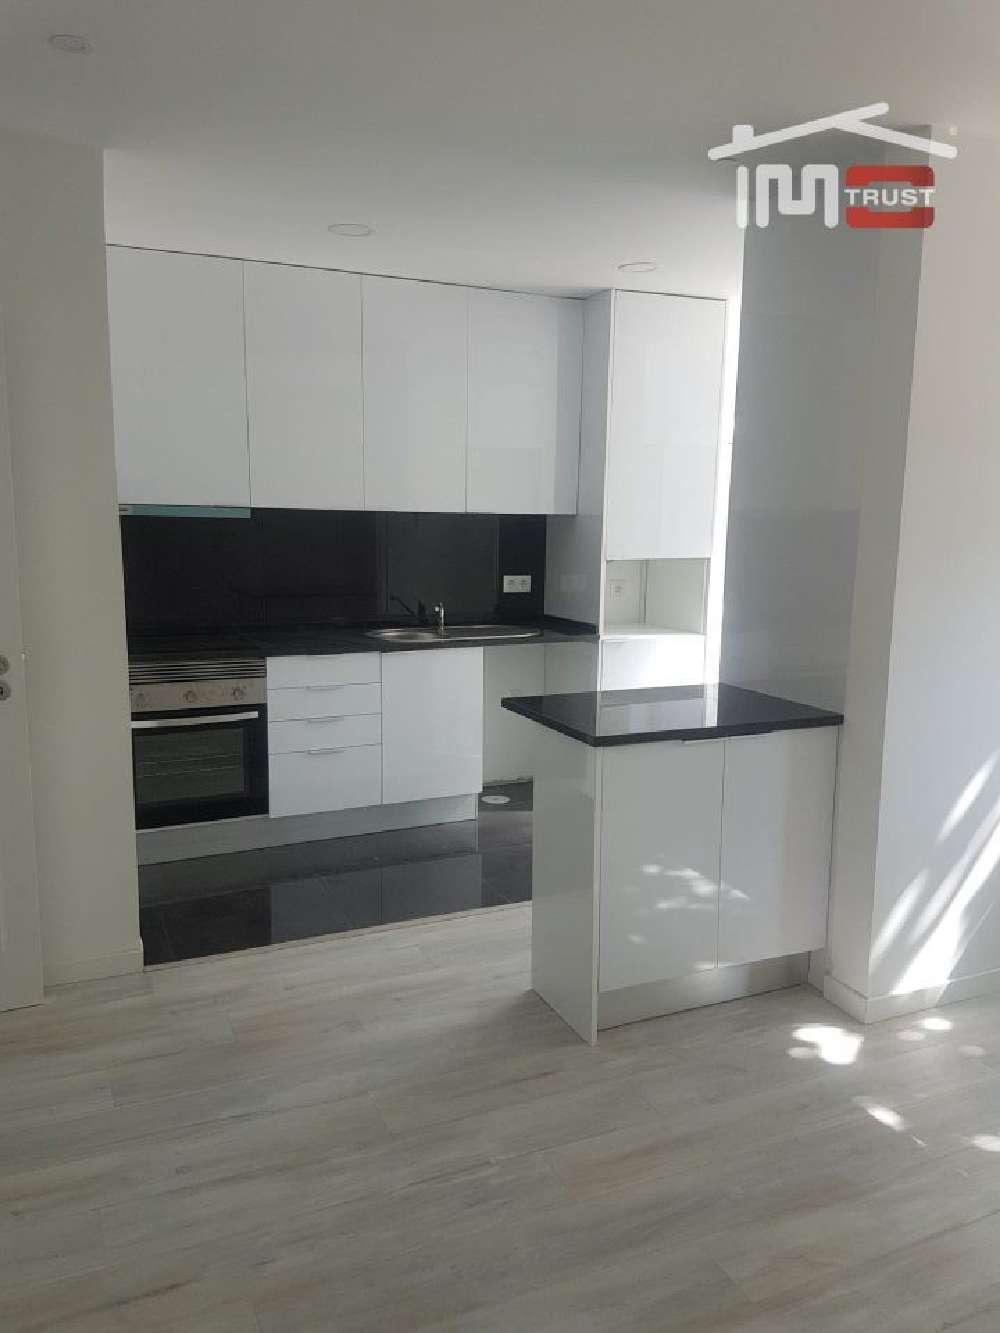 Barreiro Barreiro apartment picture 155546